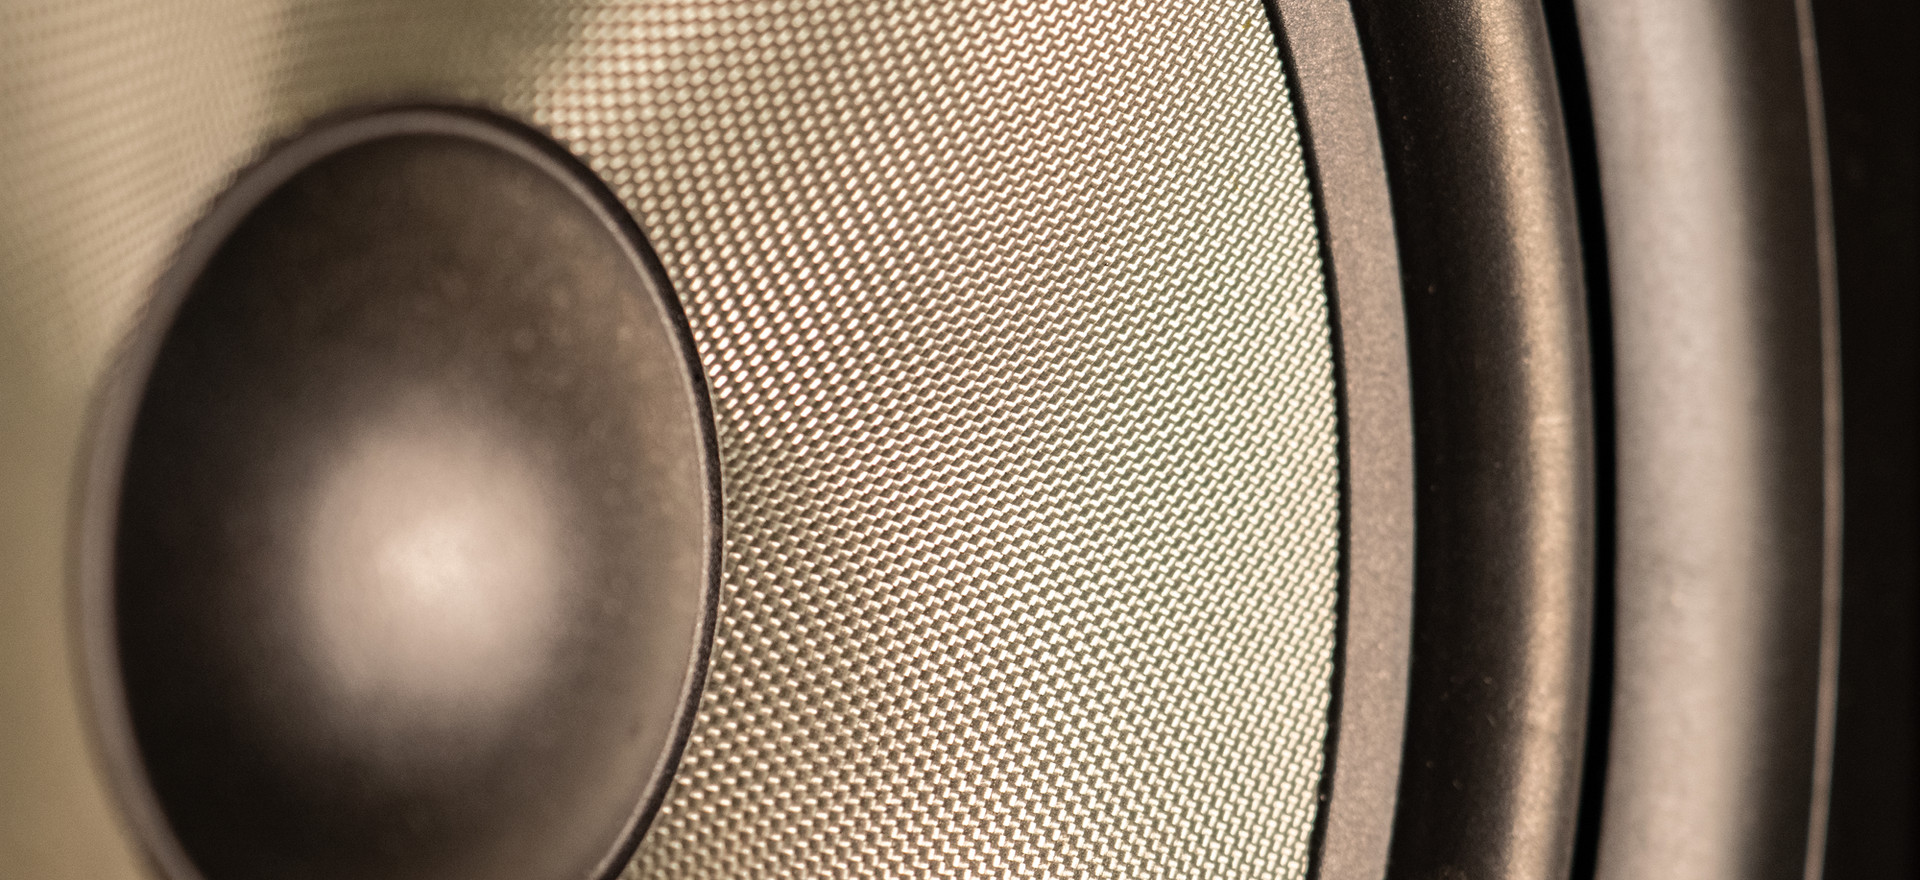 Live Sound Reinforcement